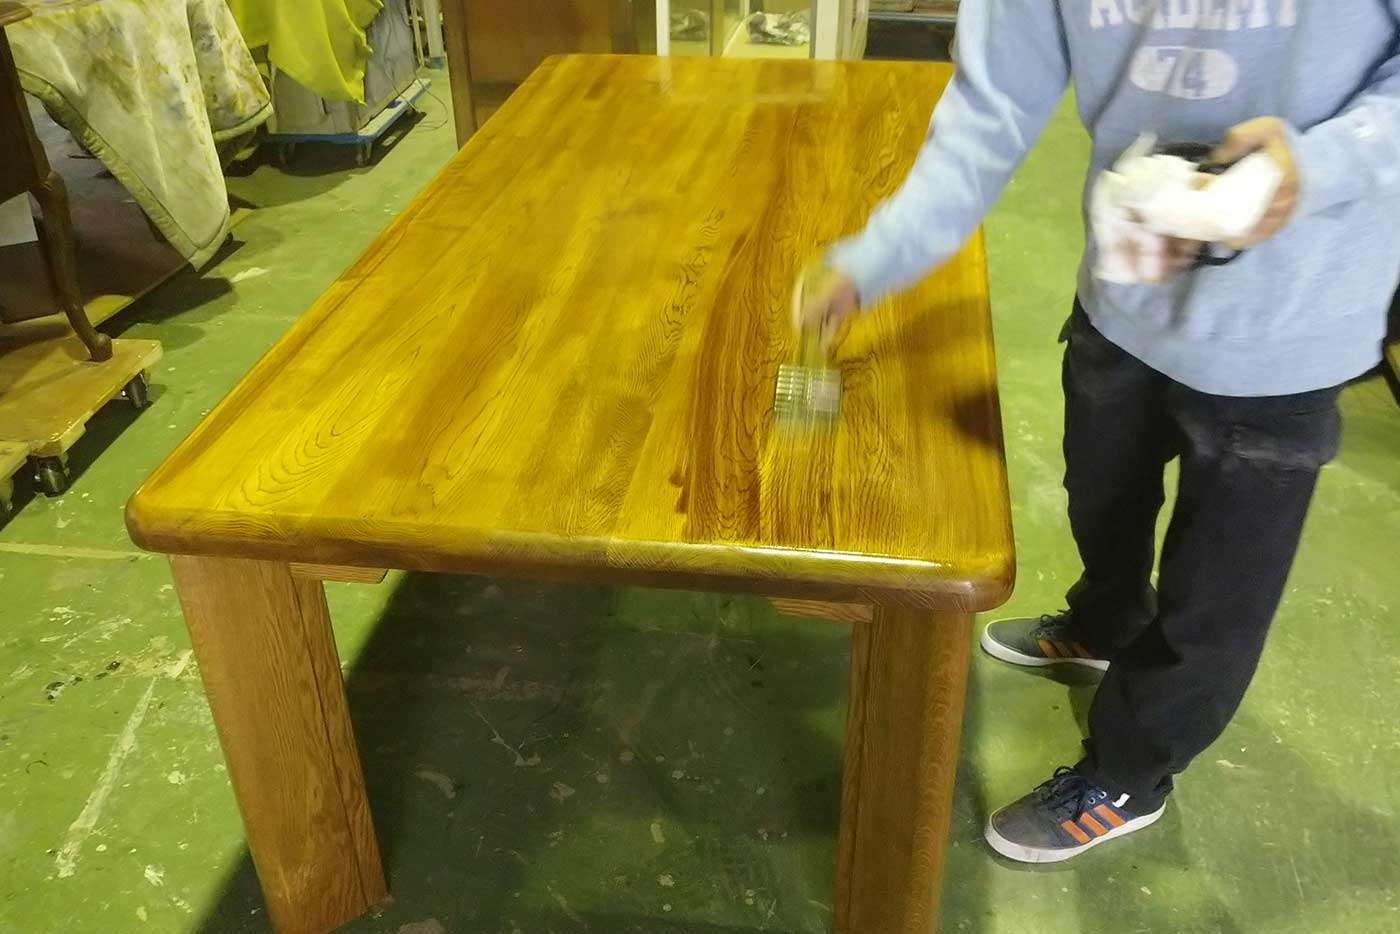 I様 テーブル 天板削り 修理